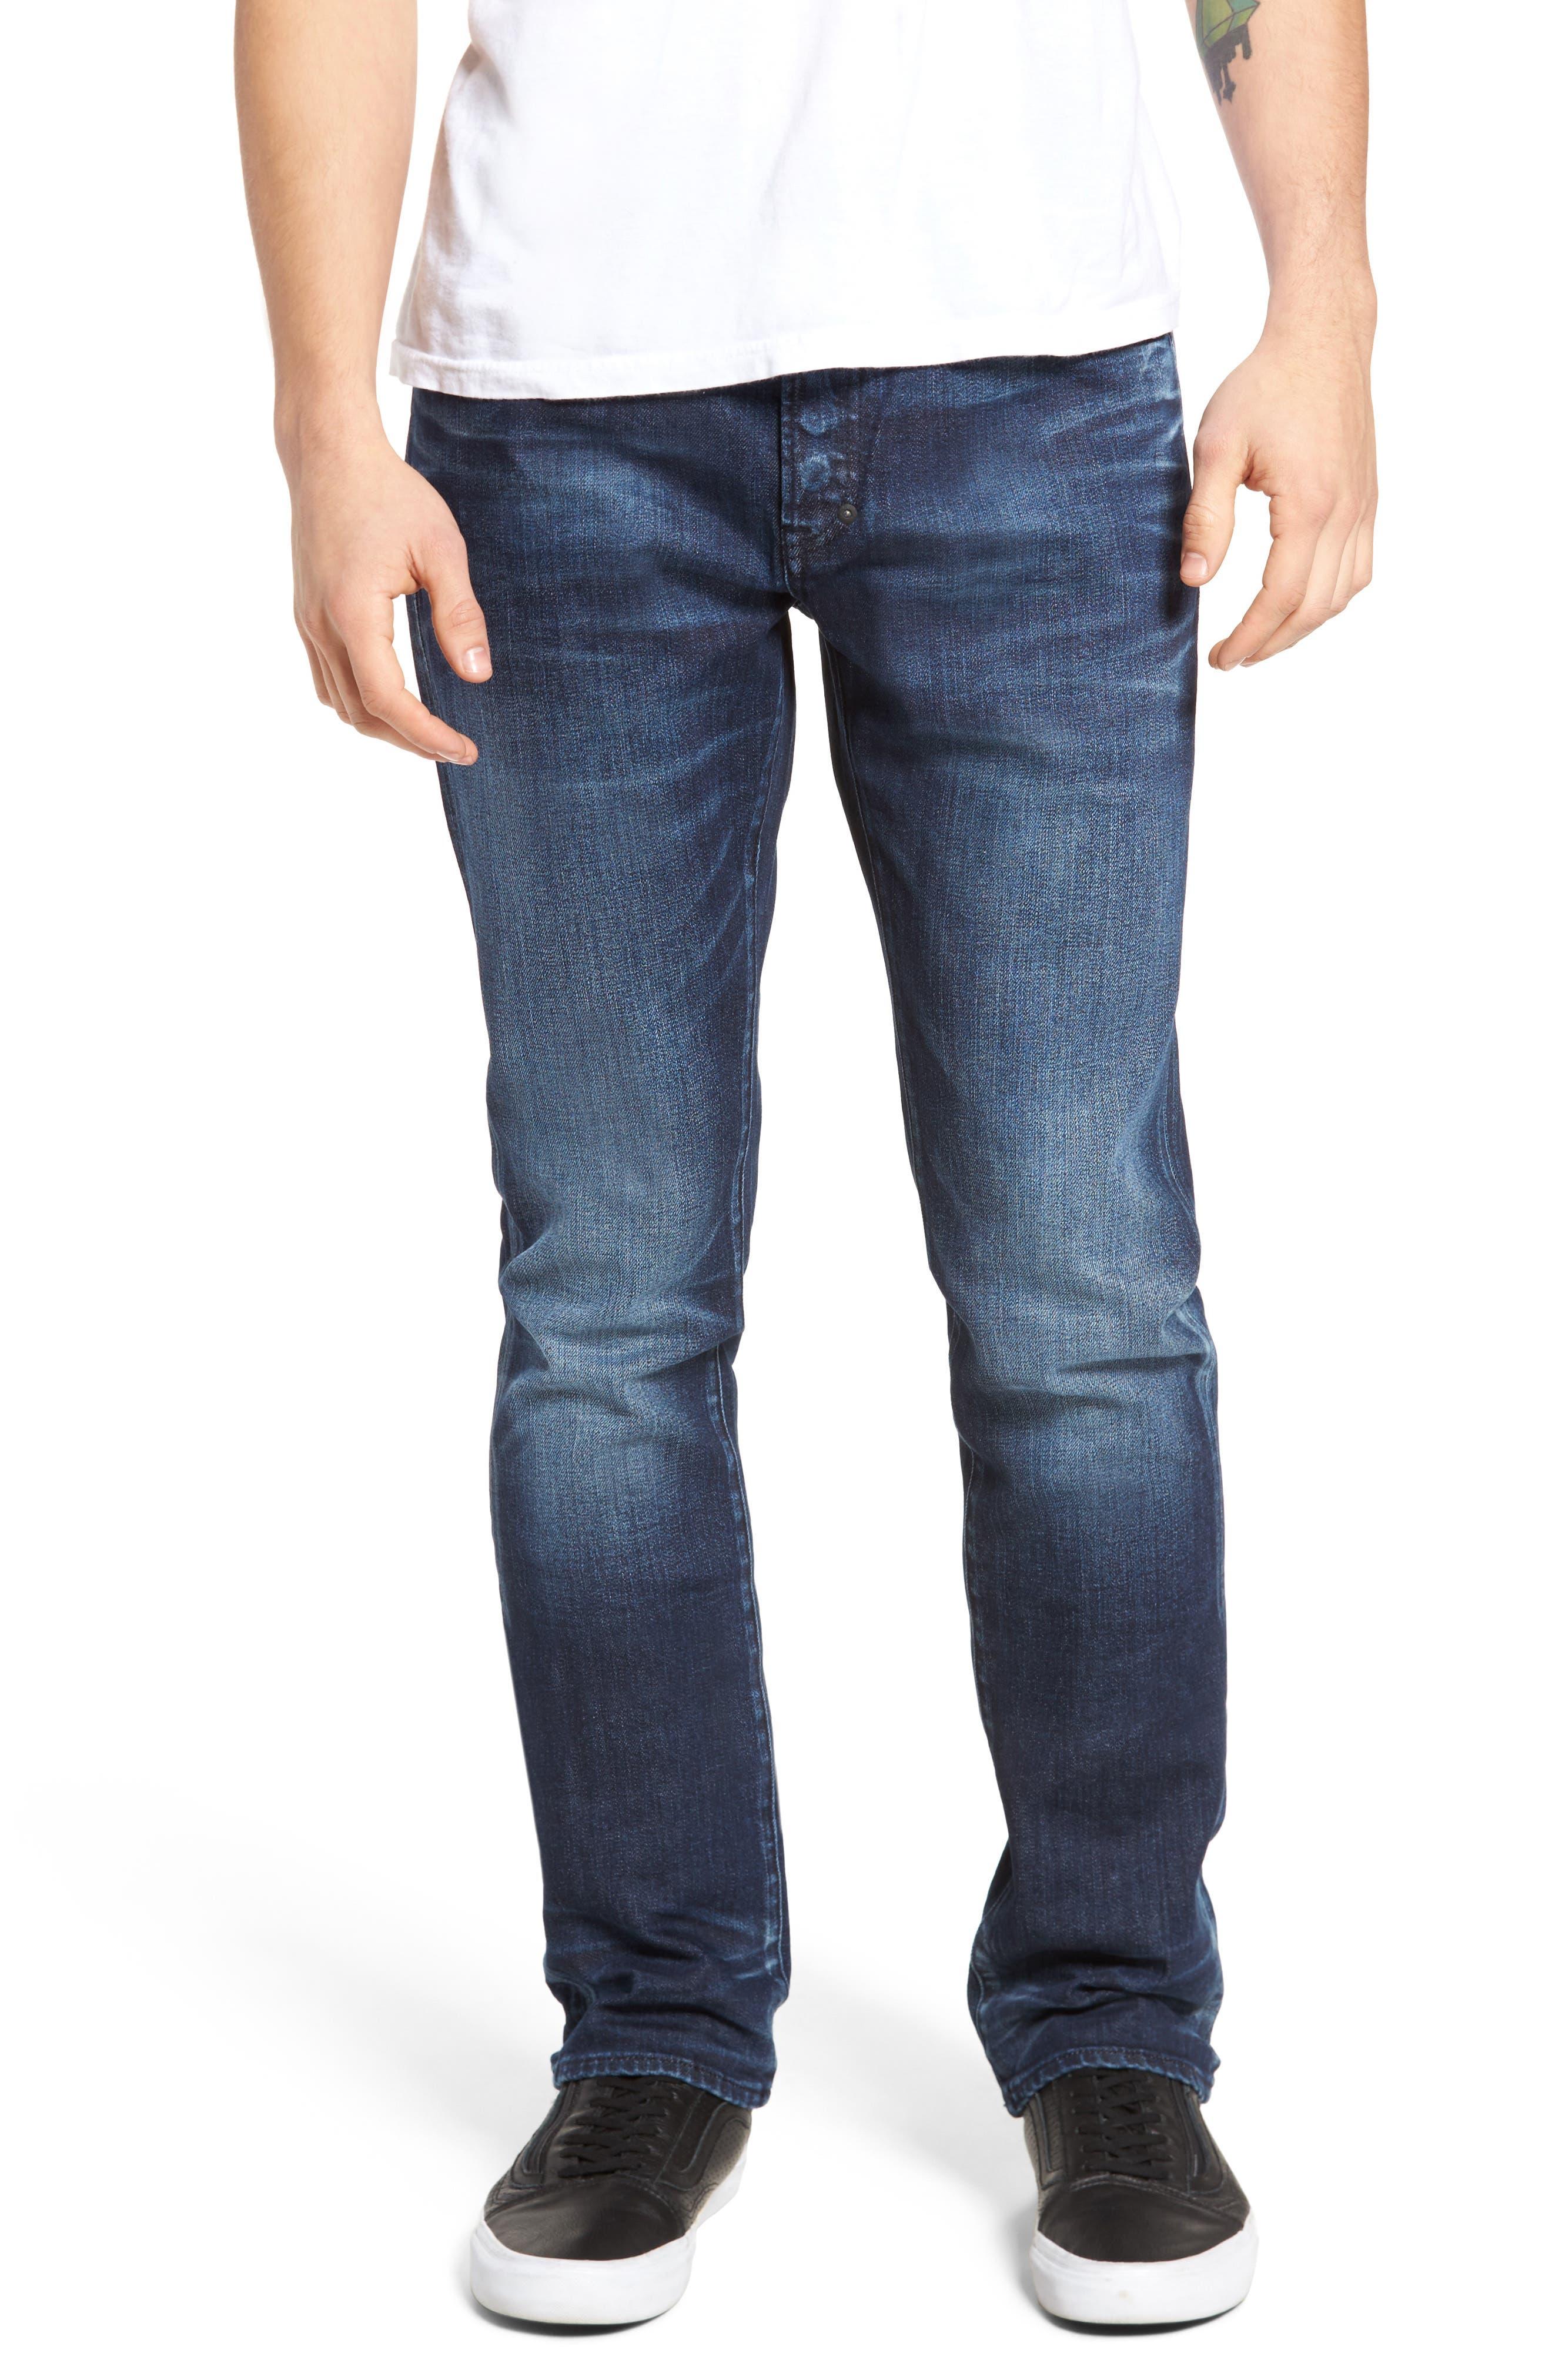 Demon Slim Straight Leg Jeans,                         Main,                         color, Dark Blue